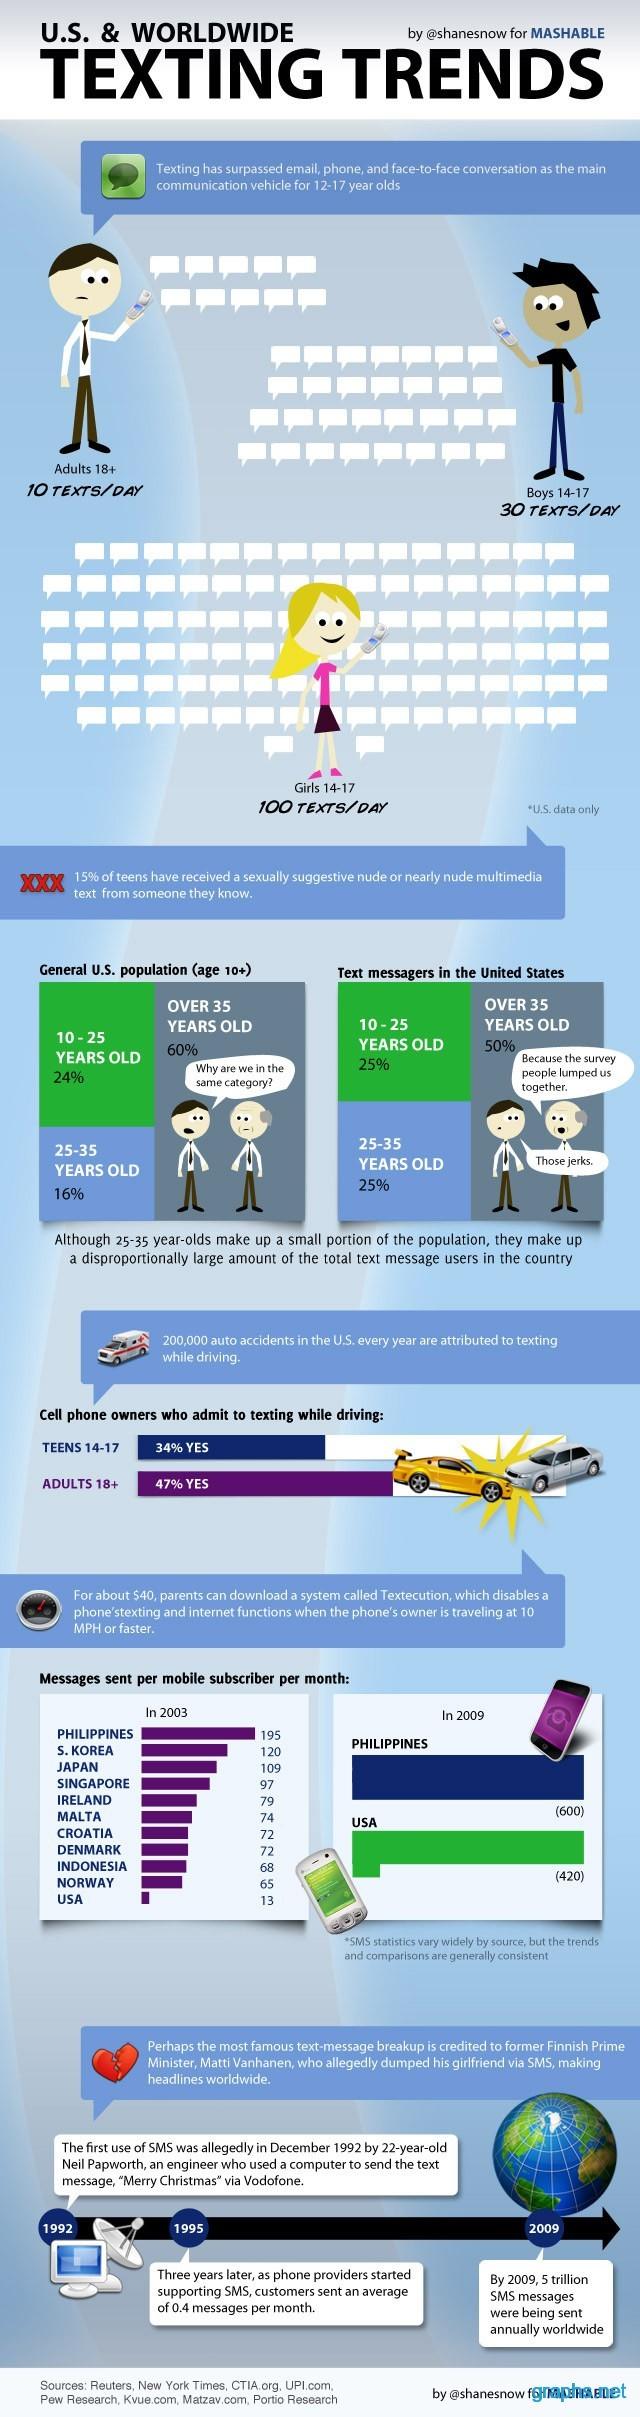 Texting Statistics in U.S & Worldwide